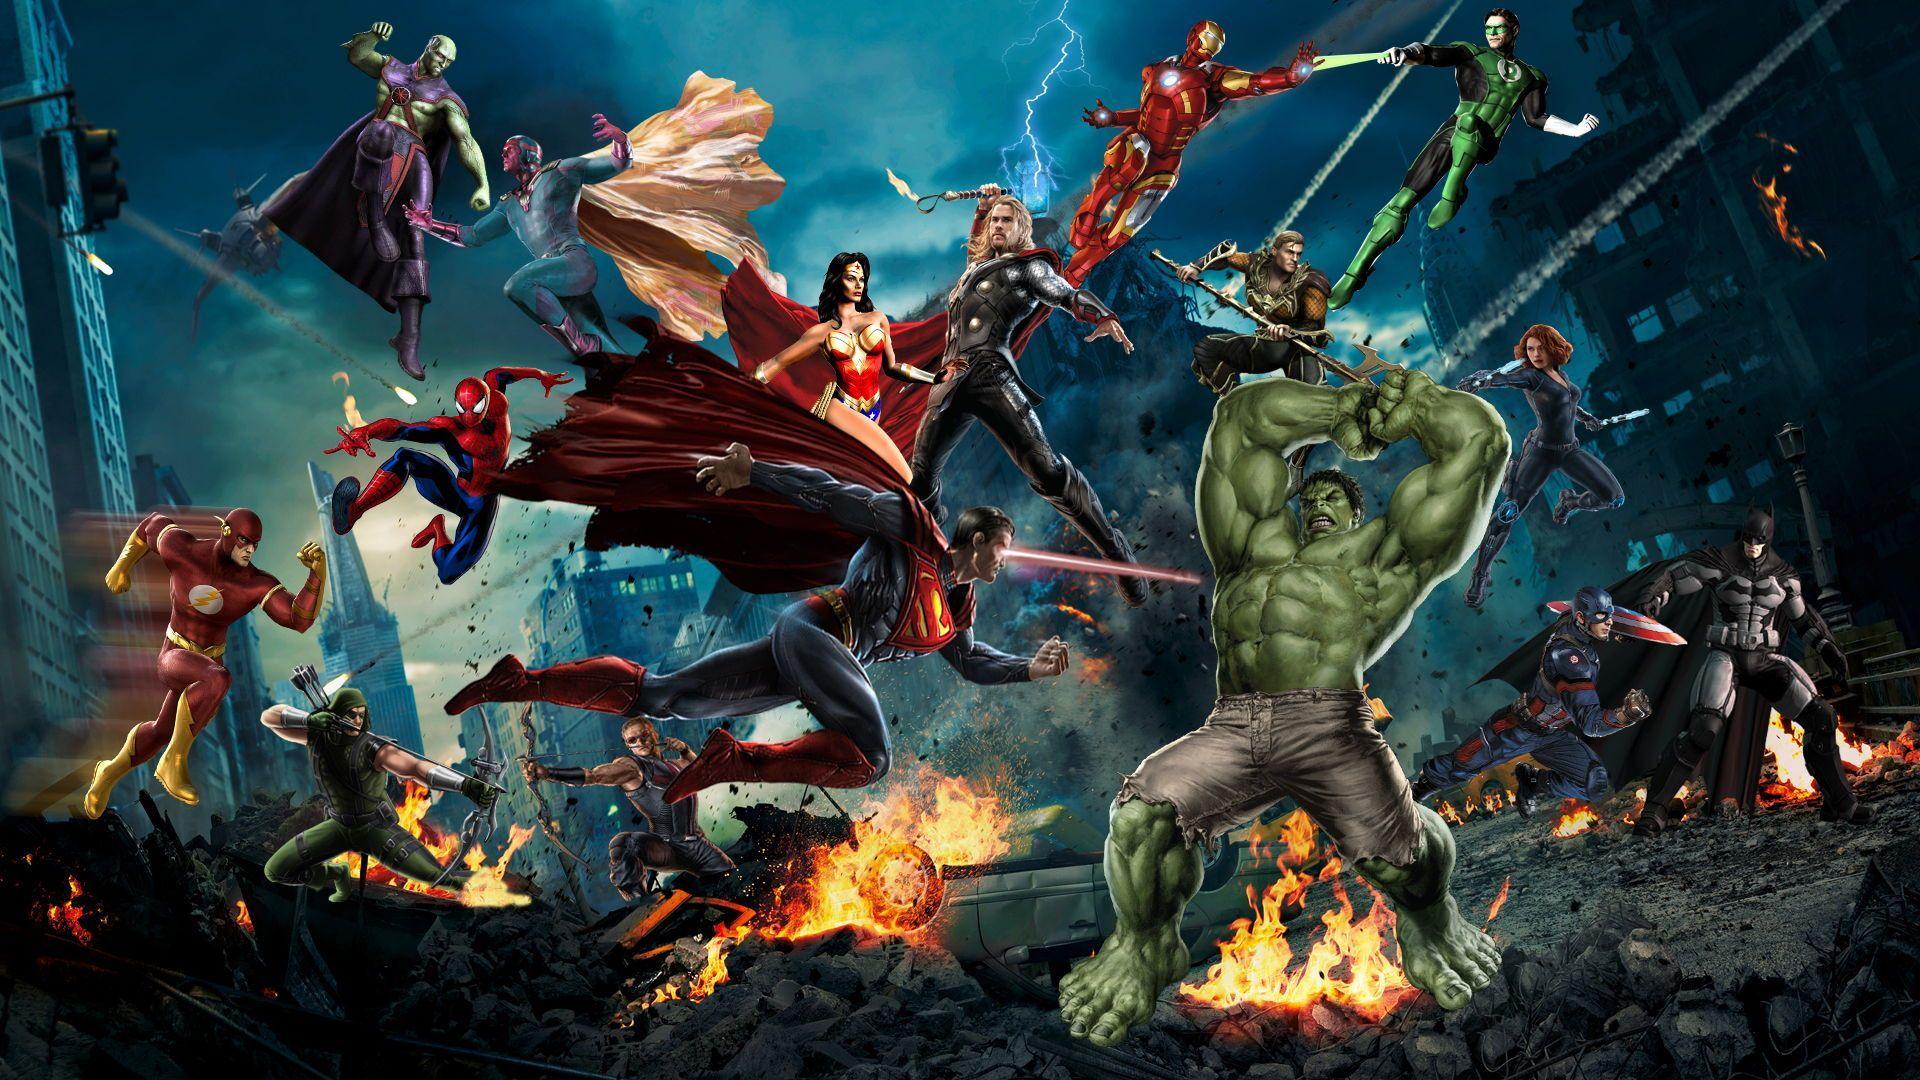 Avengers Vs Justice League Which Superhero Team Will Win The Fight Avengers Vs Justice League Marvel Vs Marvel Vs Dc